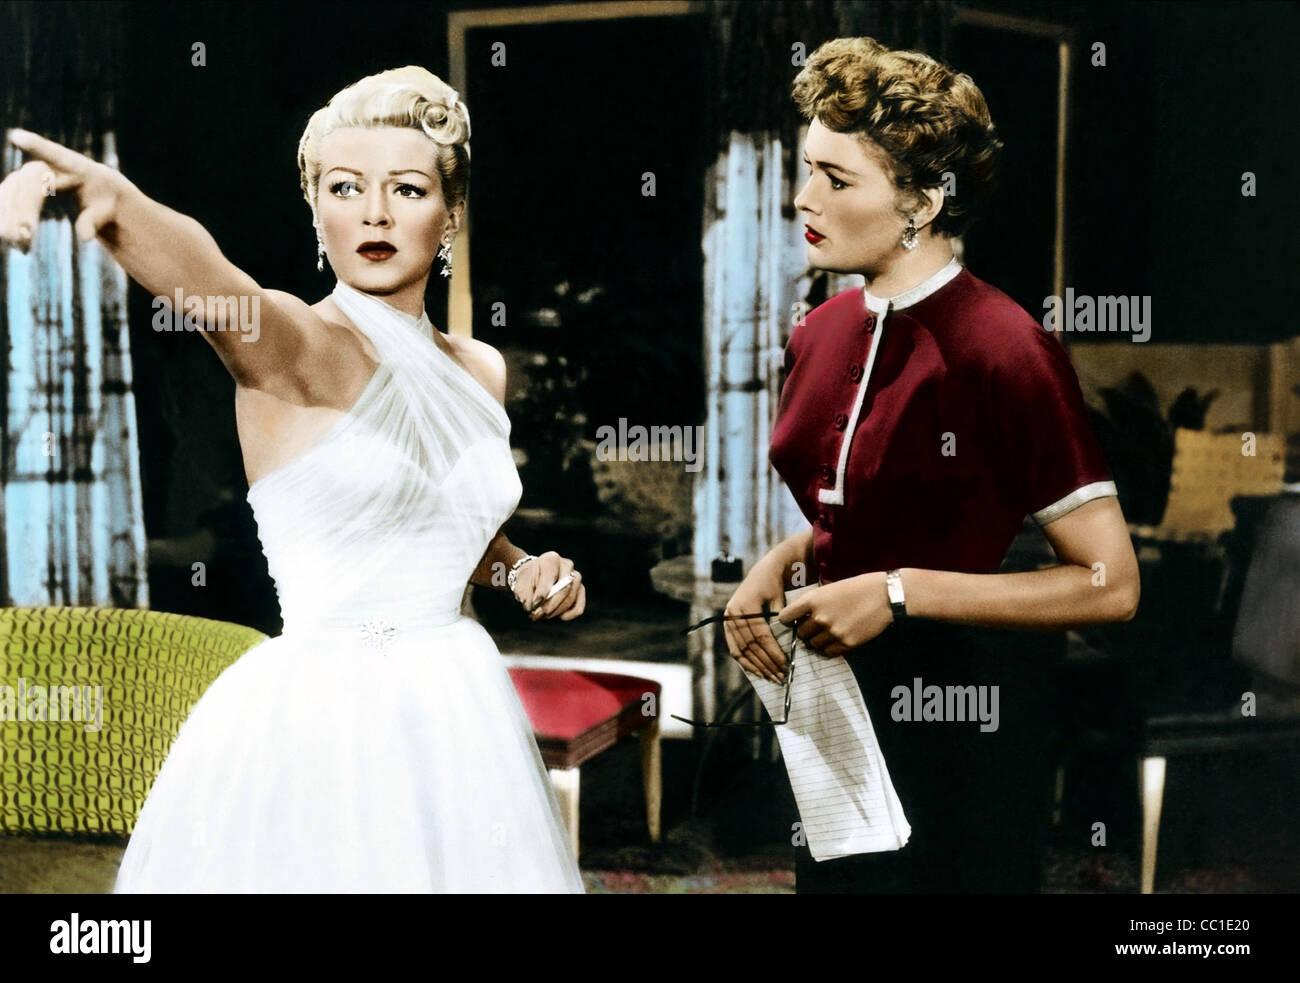 LANA TURNER, JEAN HAGEN, d'amants, 1953 Photo Stock